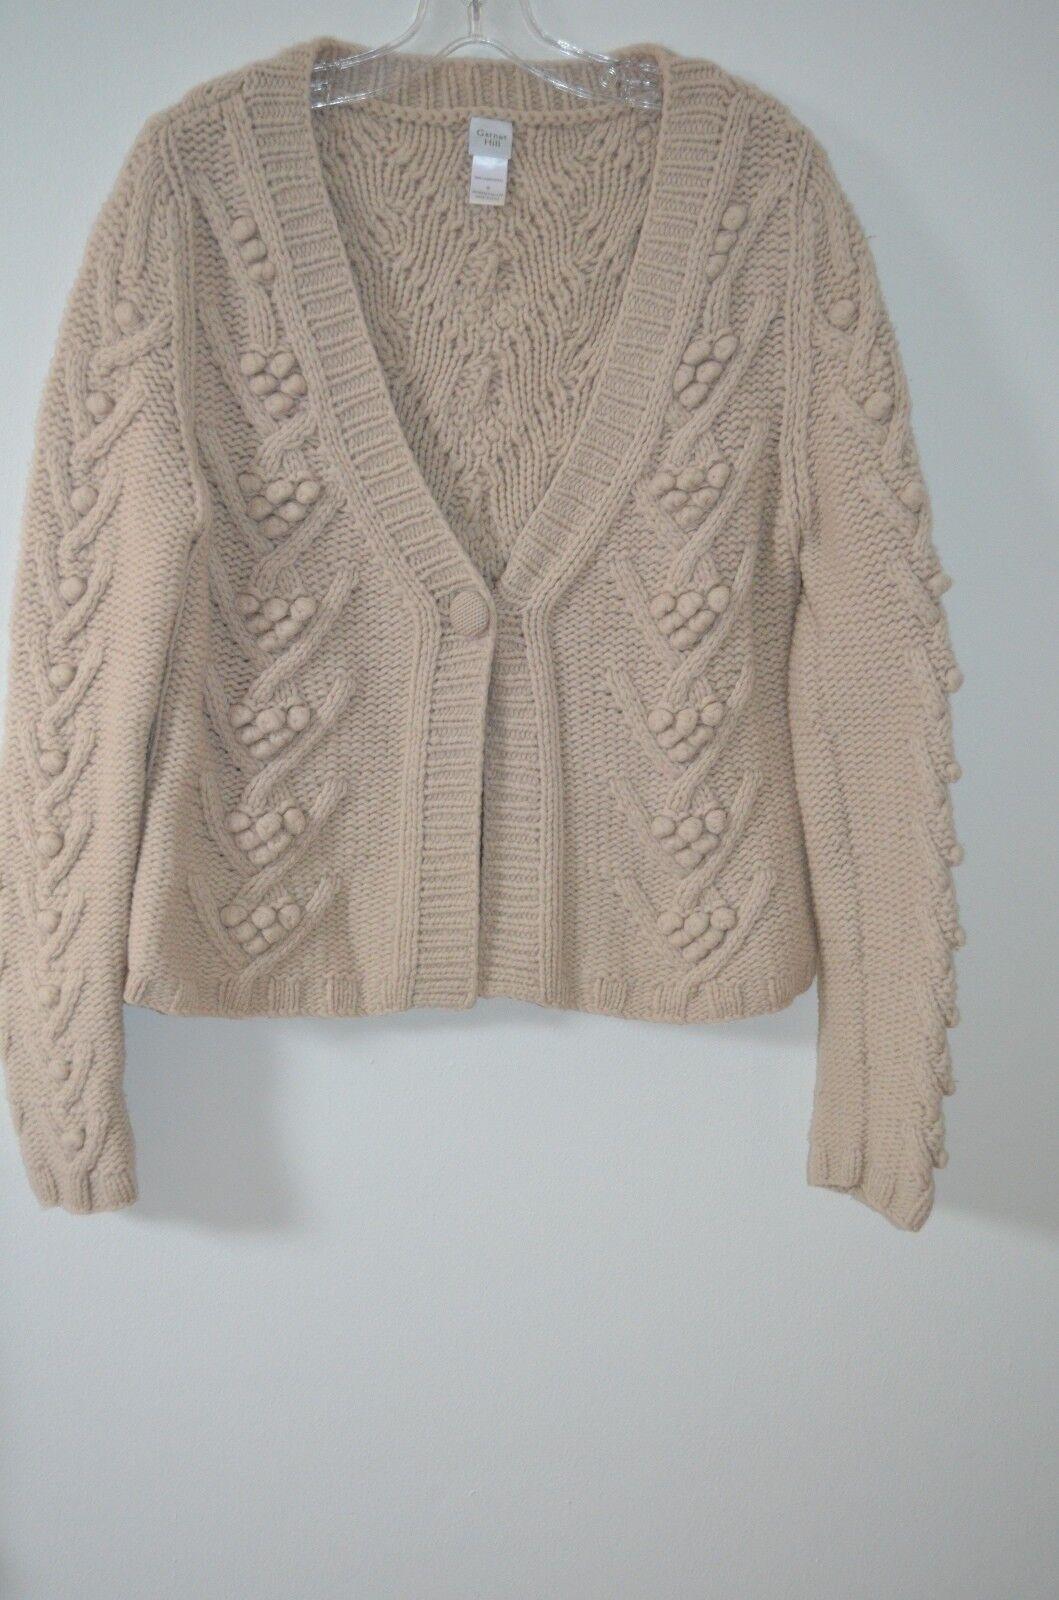 Garnet Hill Beige Chunky 100% Lambswool Popcorn Stitch Cardigan Sweater Size M